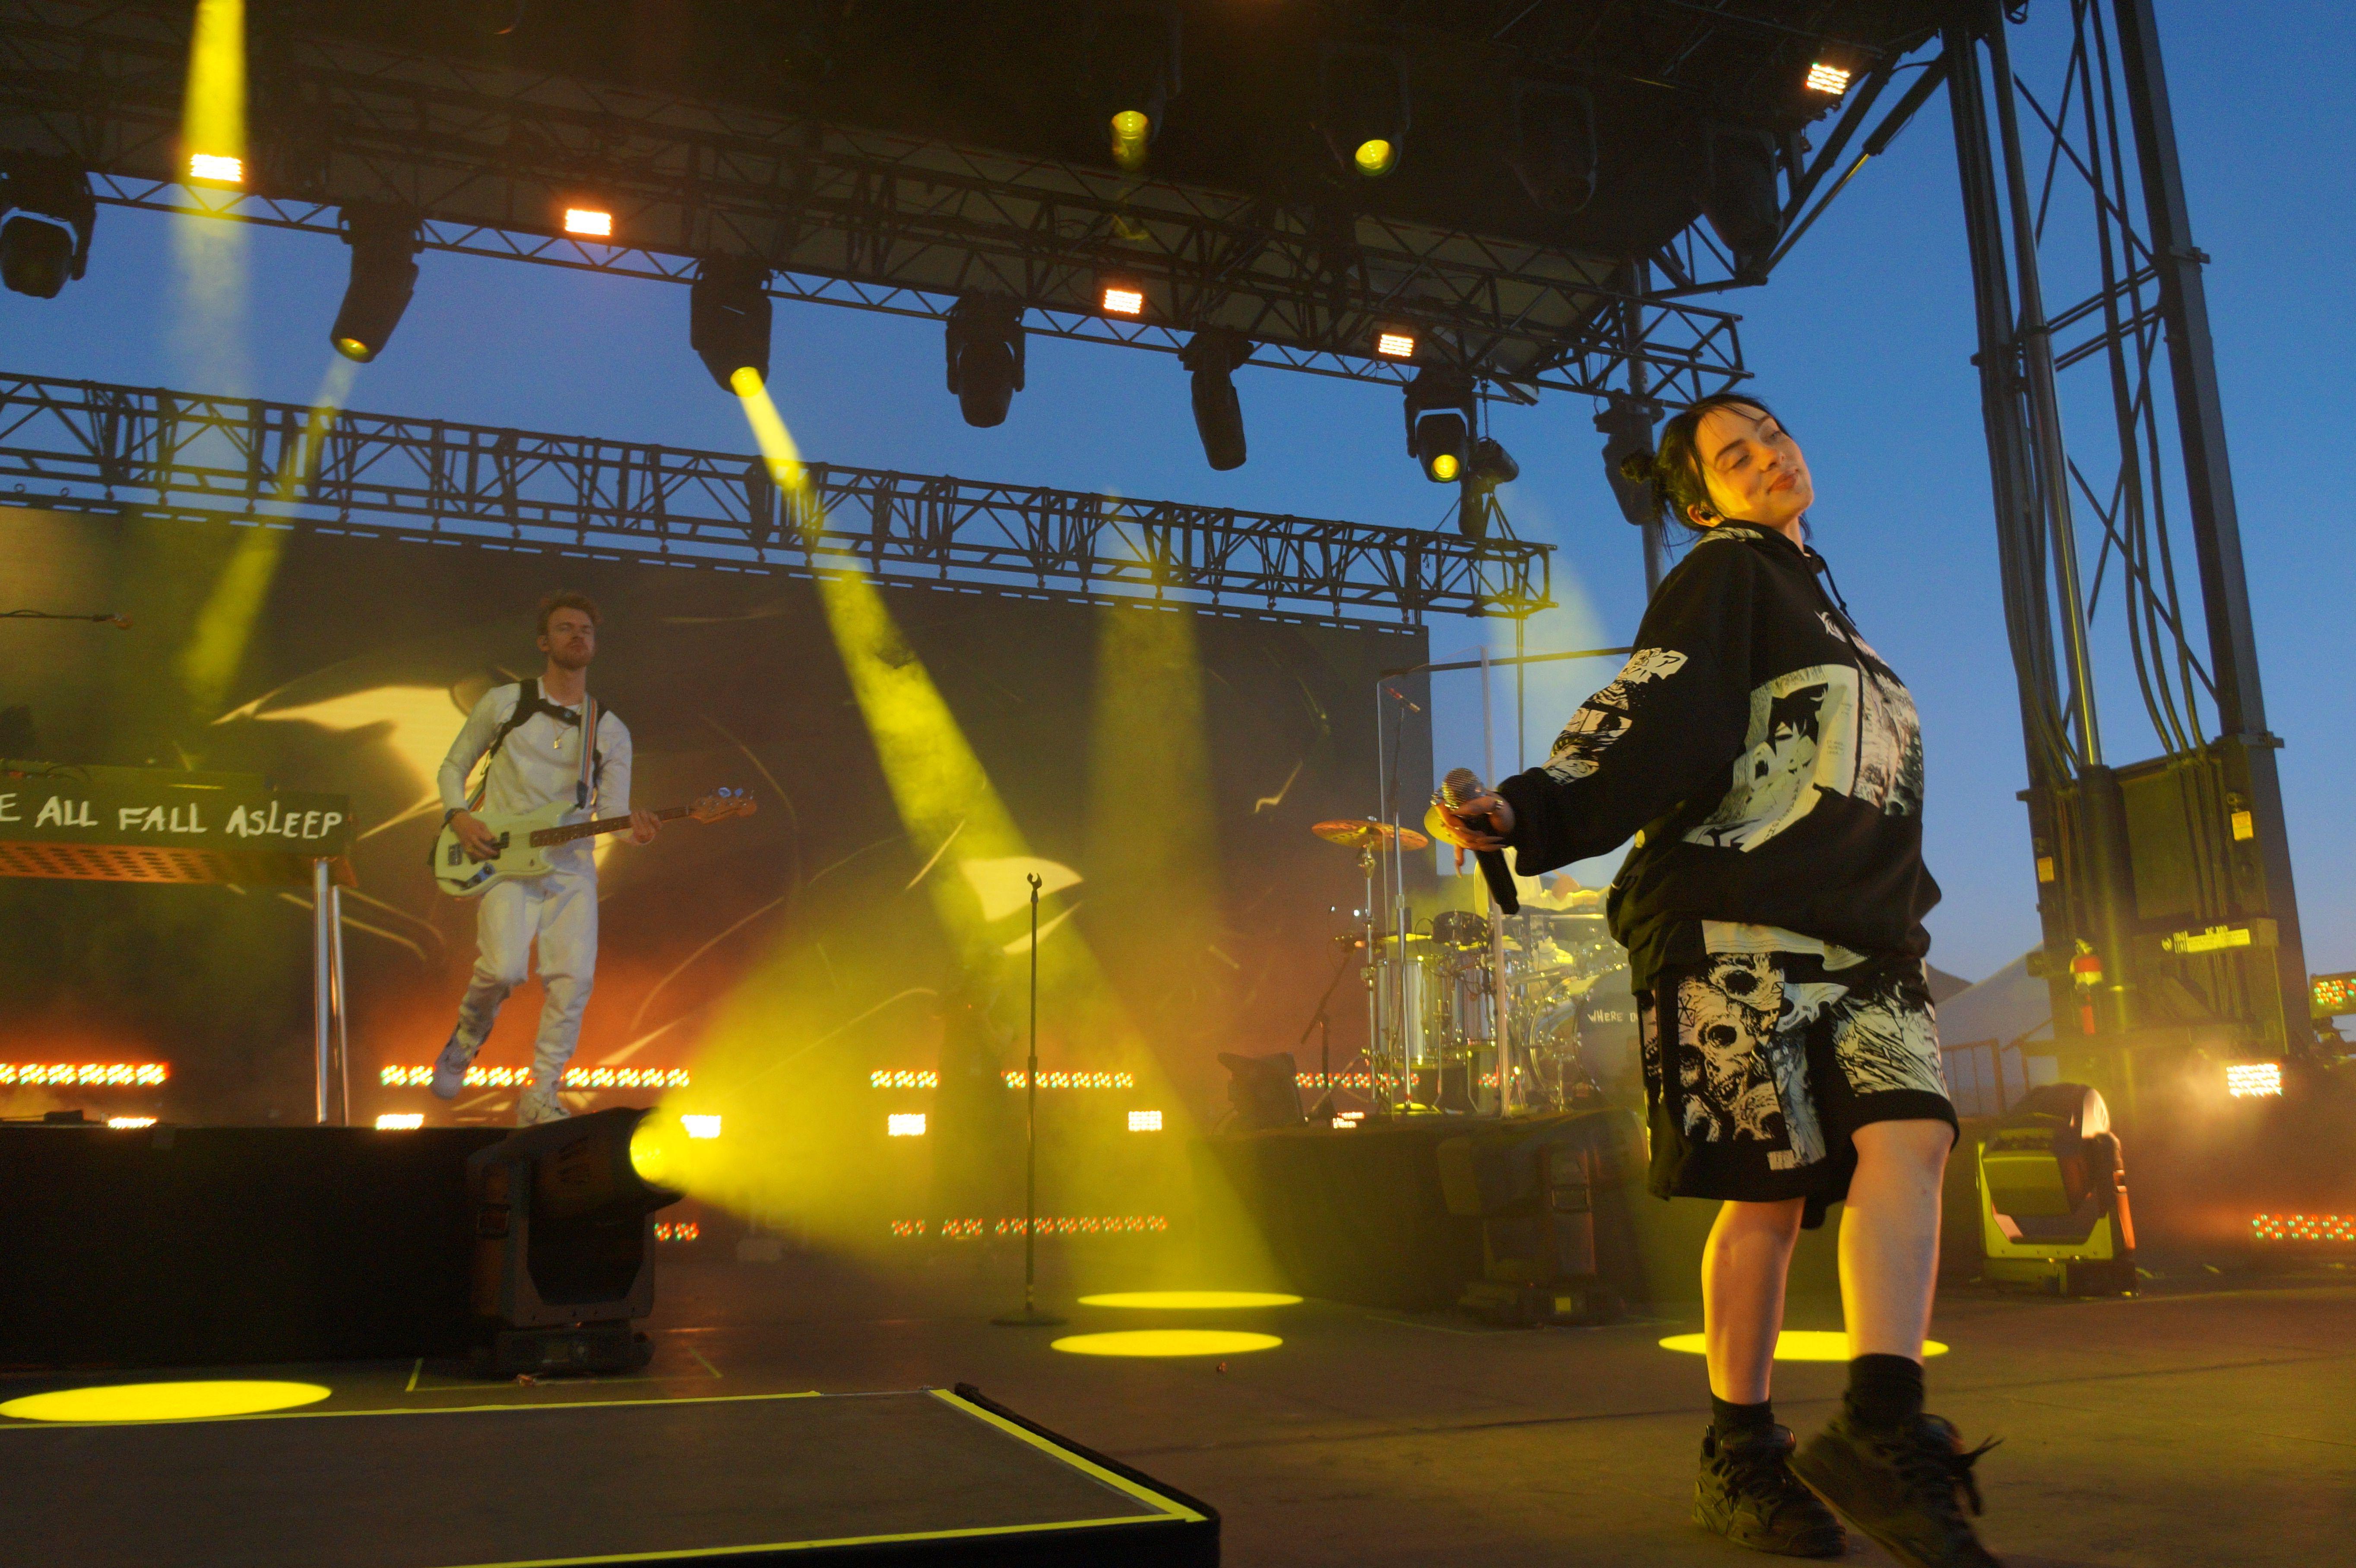 Billie Eilish Concert Heat Inspires Chaos At Saltair Billie Billie Eilish Concert